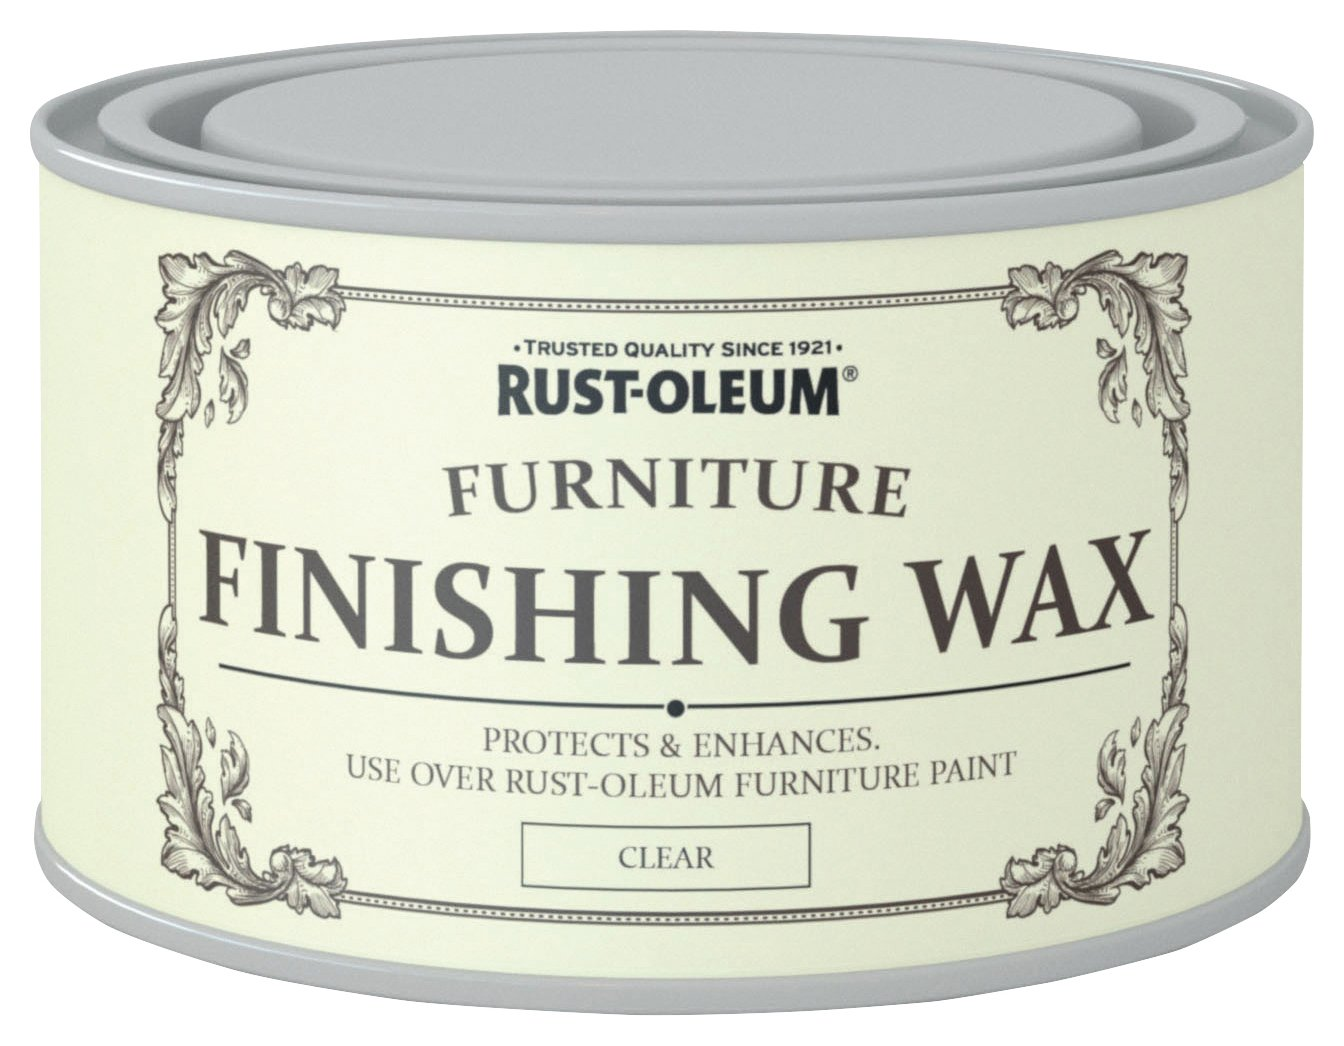 Rust-Oleum Furniture Finishing Wax 400ml - Clear lowest price